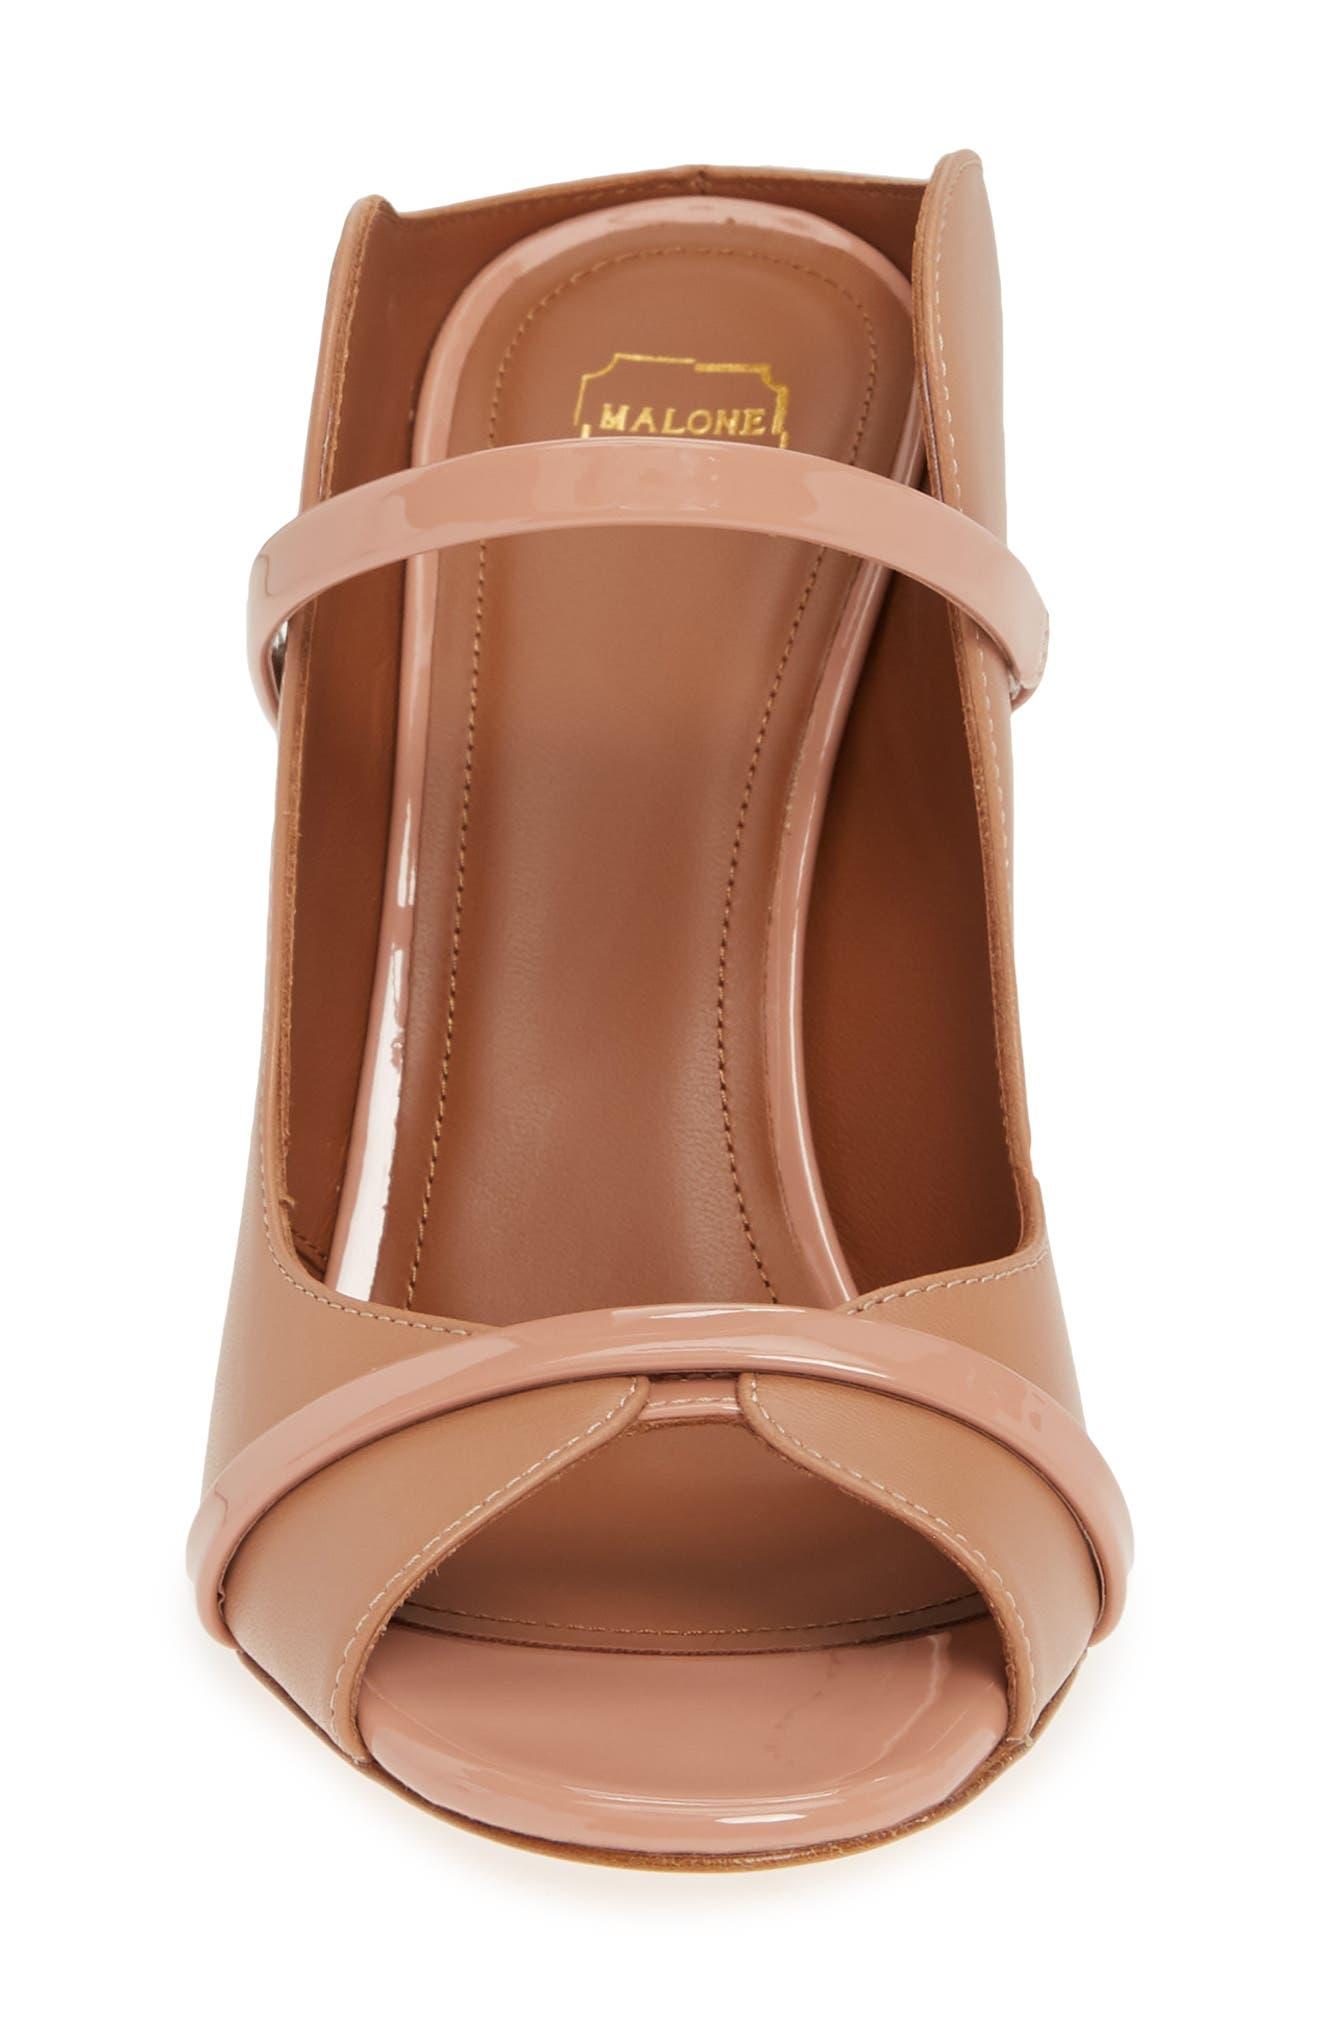 MALONE SOULIERS,                             Norah Block Heel Sandal,                             Alternate thumbnail 4, color,                             NUDE/ BLUSH